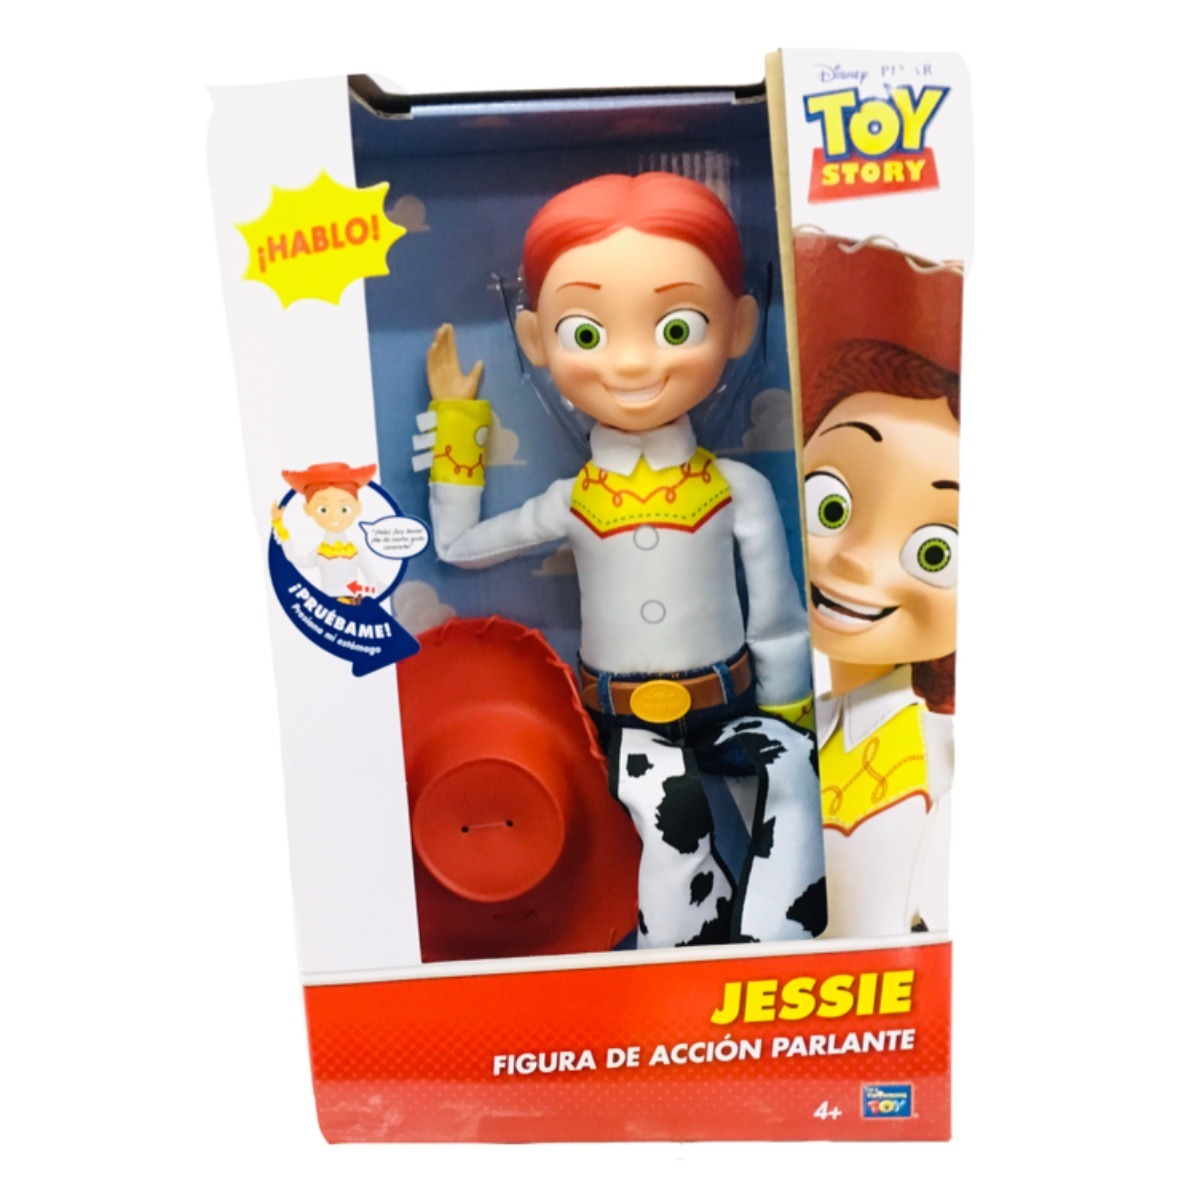 Toy Story Jessie Figura De Acción 15 Frases Toy Plus -   899.00 en ... 5afd717e4e5